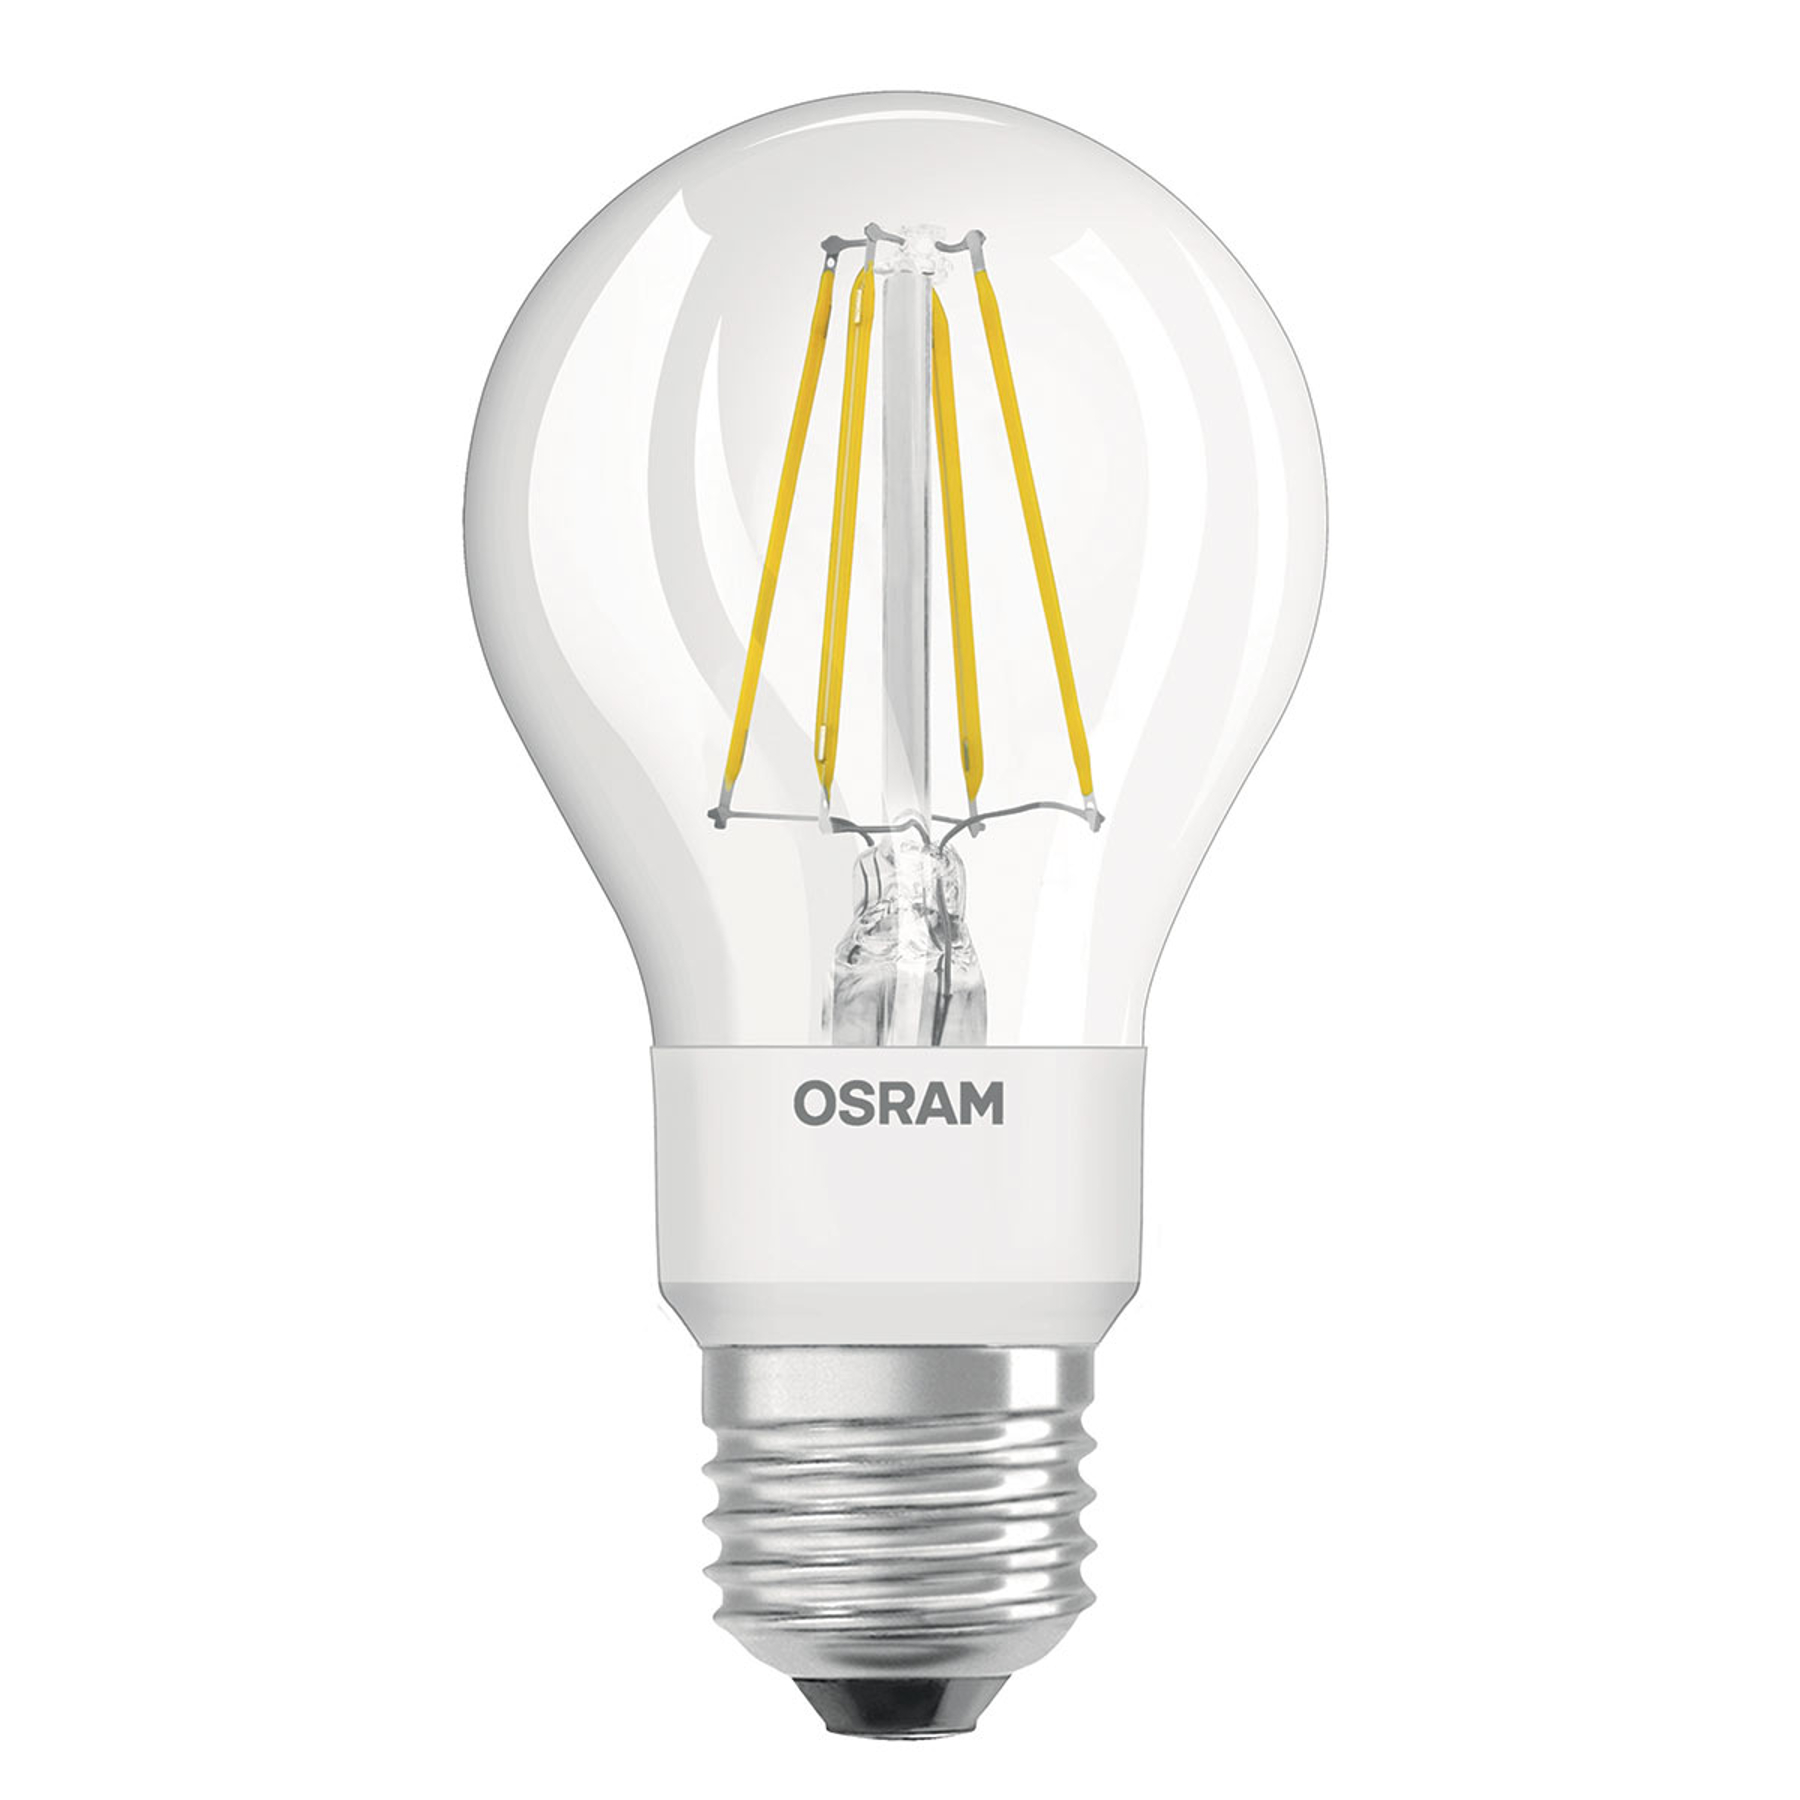 OSRAM LED 4,5W Star+ GLOWdim filamenti trasparente